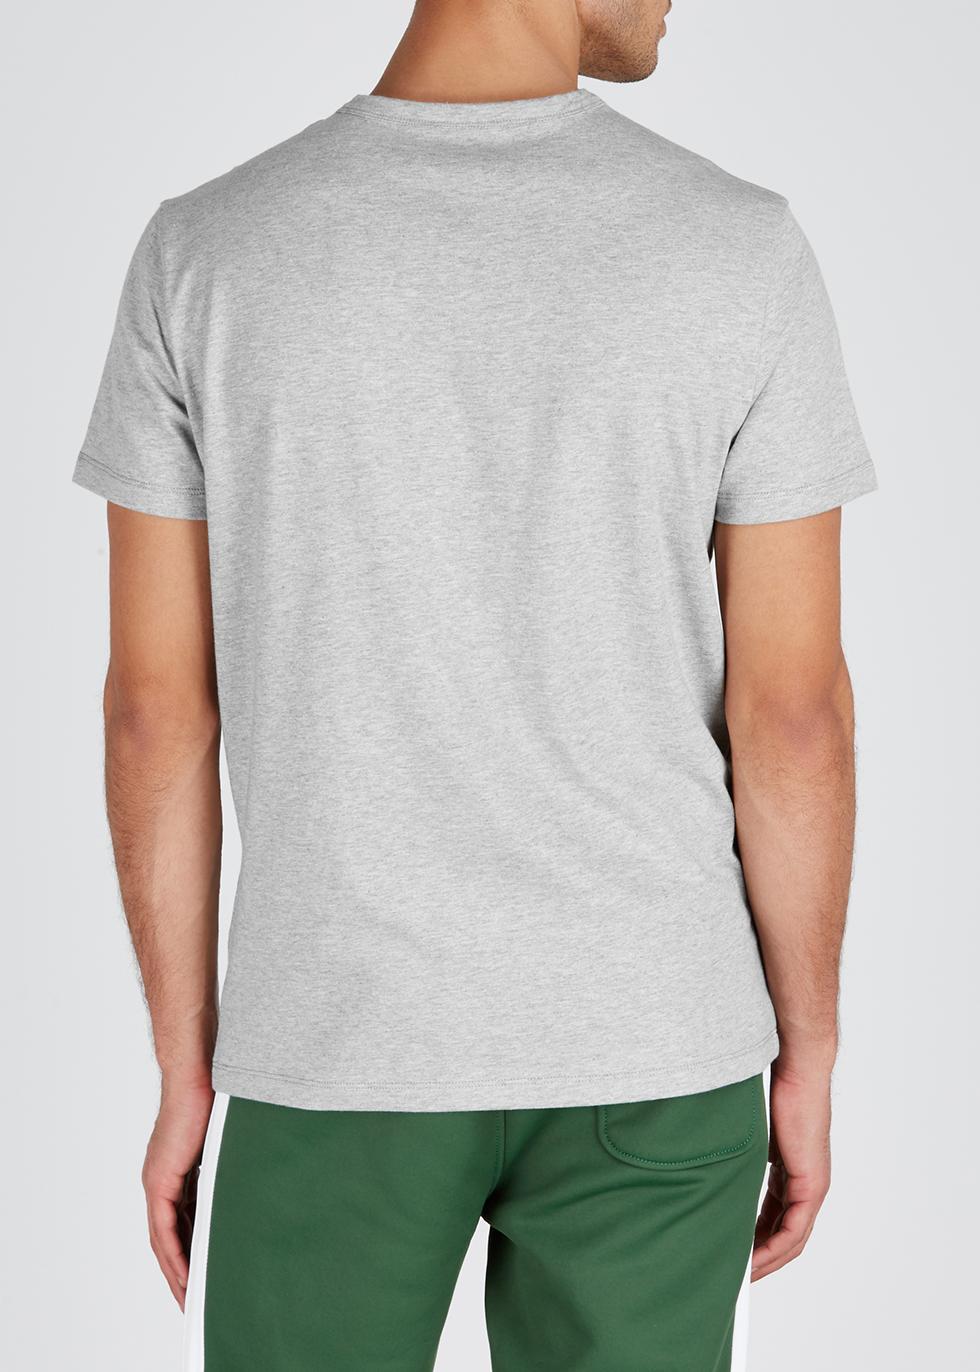 Grey printed cotton T-shirt - Moncler